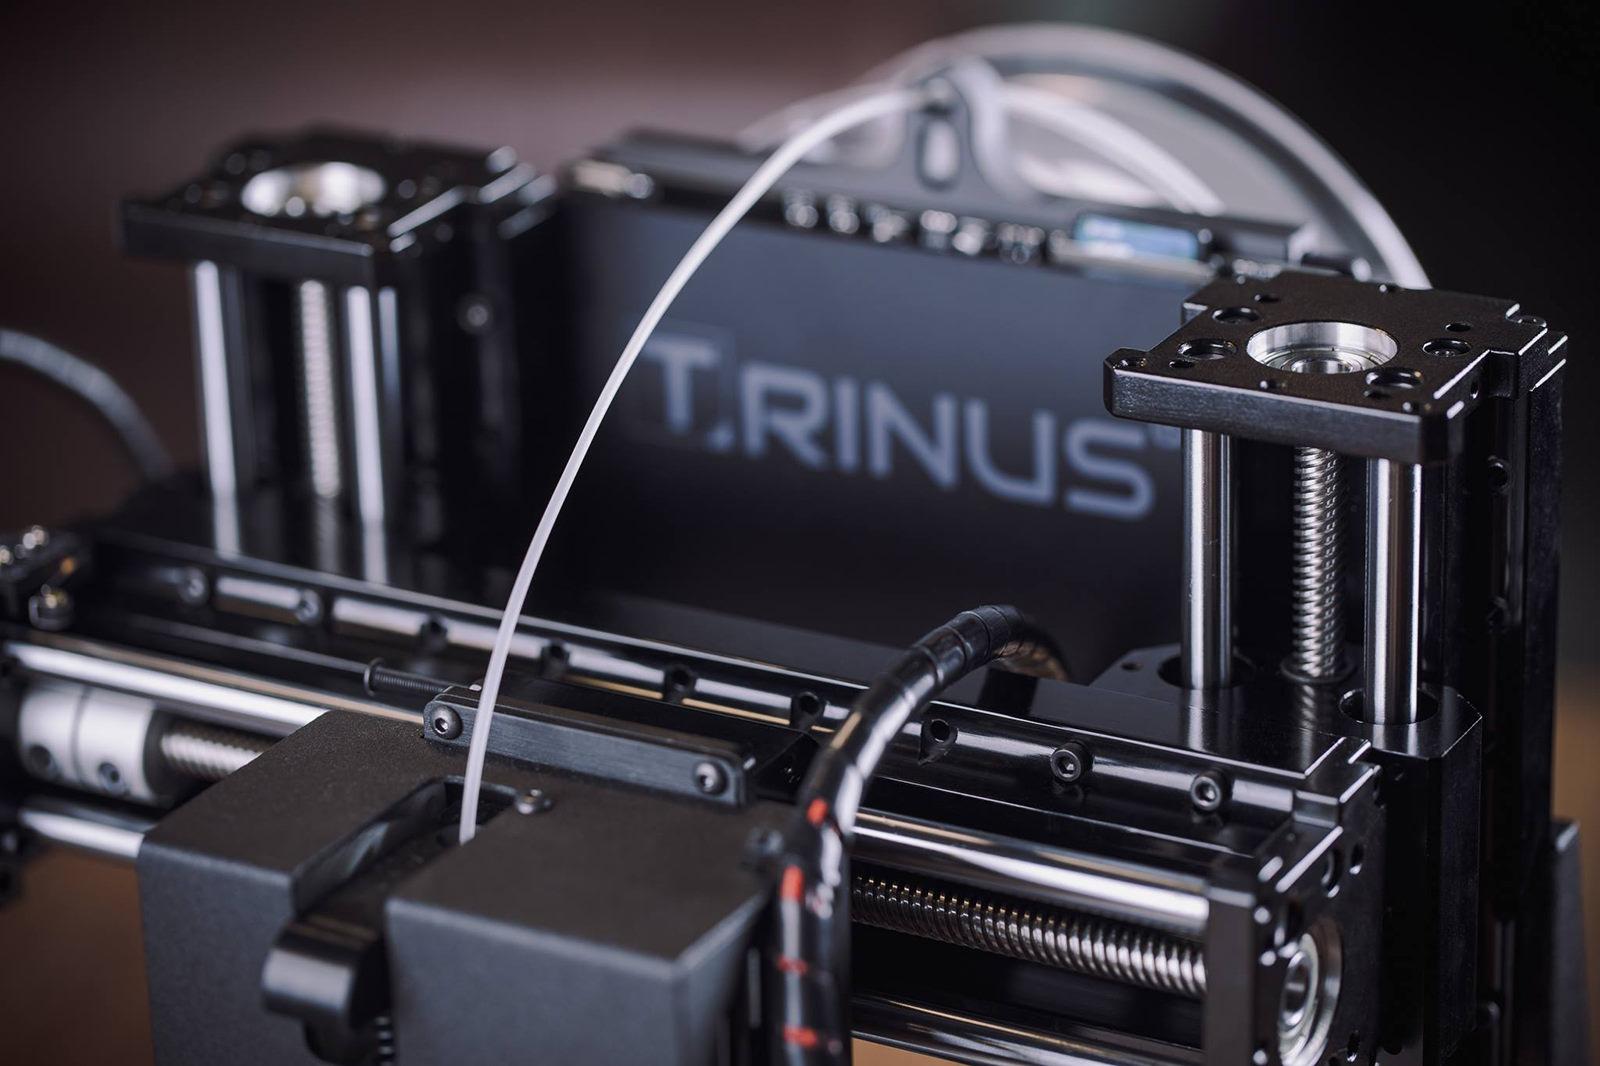 Trinus_DDDJapancom-3